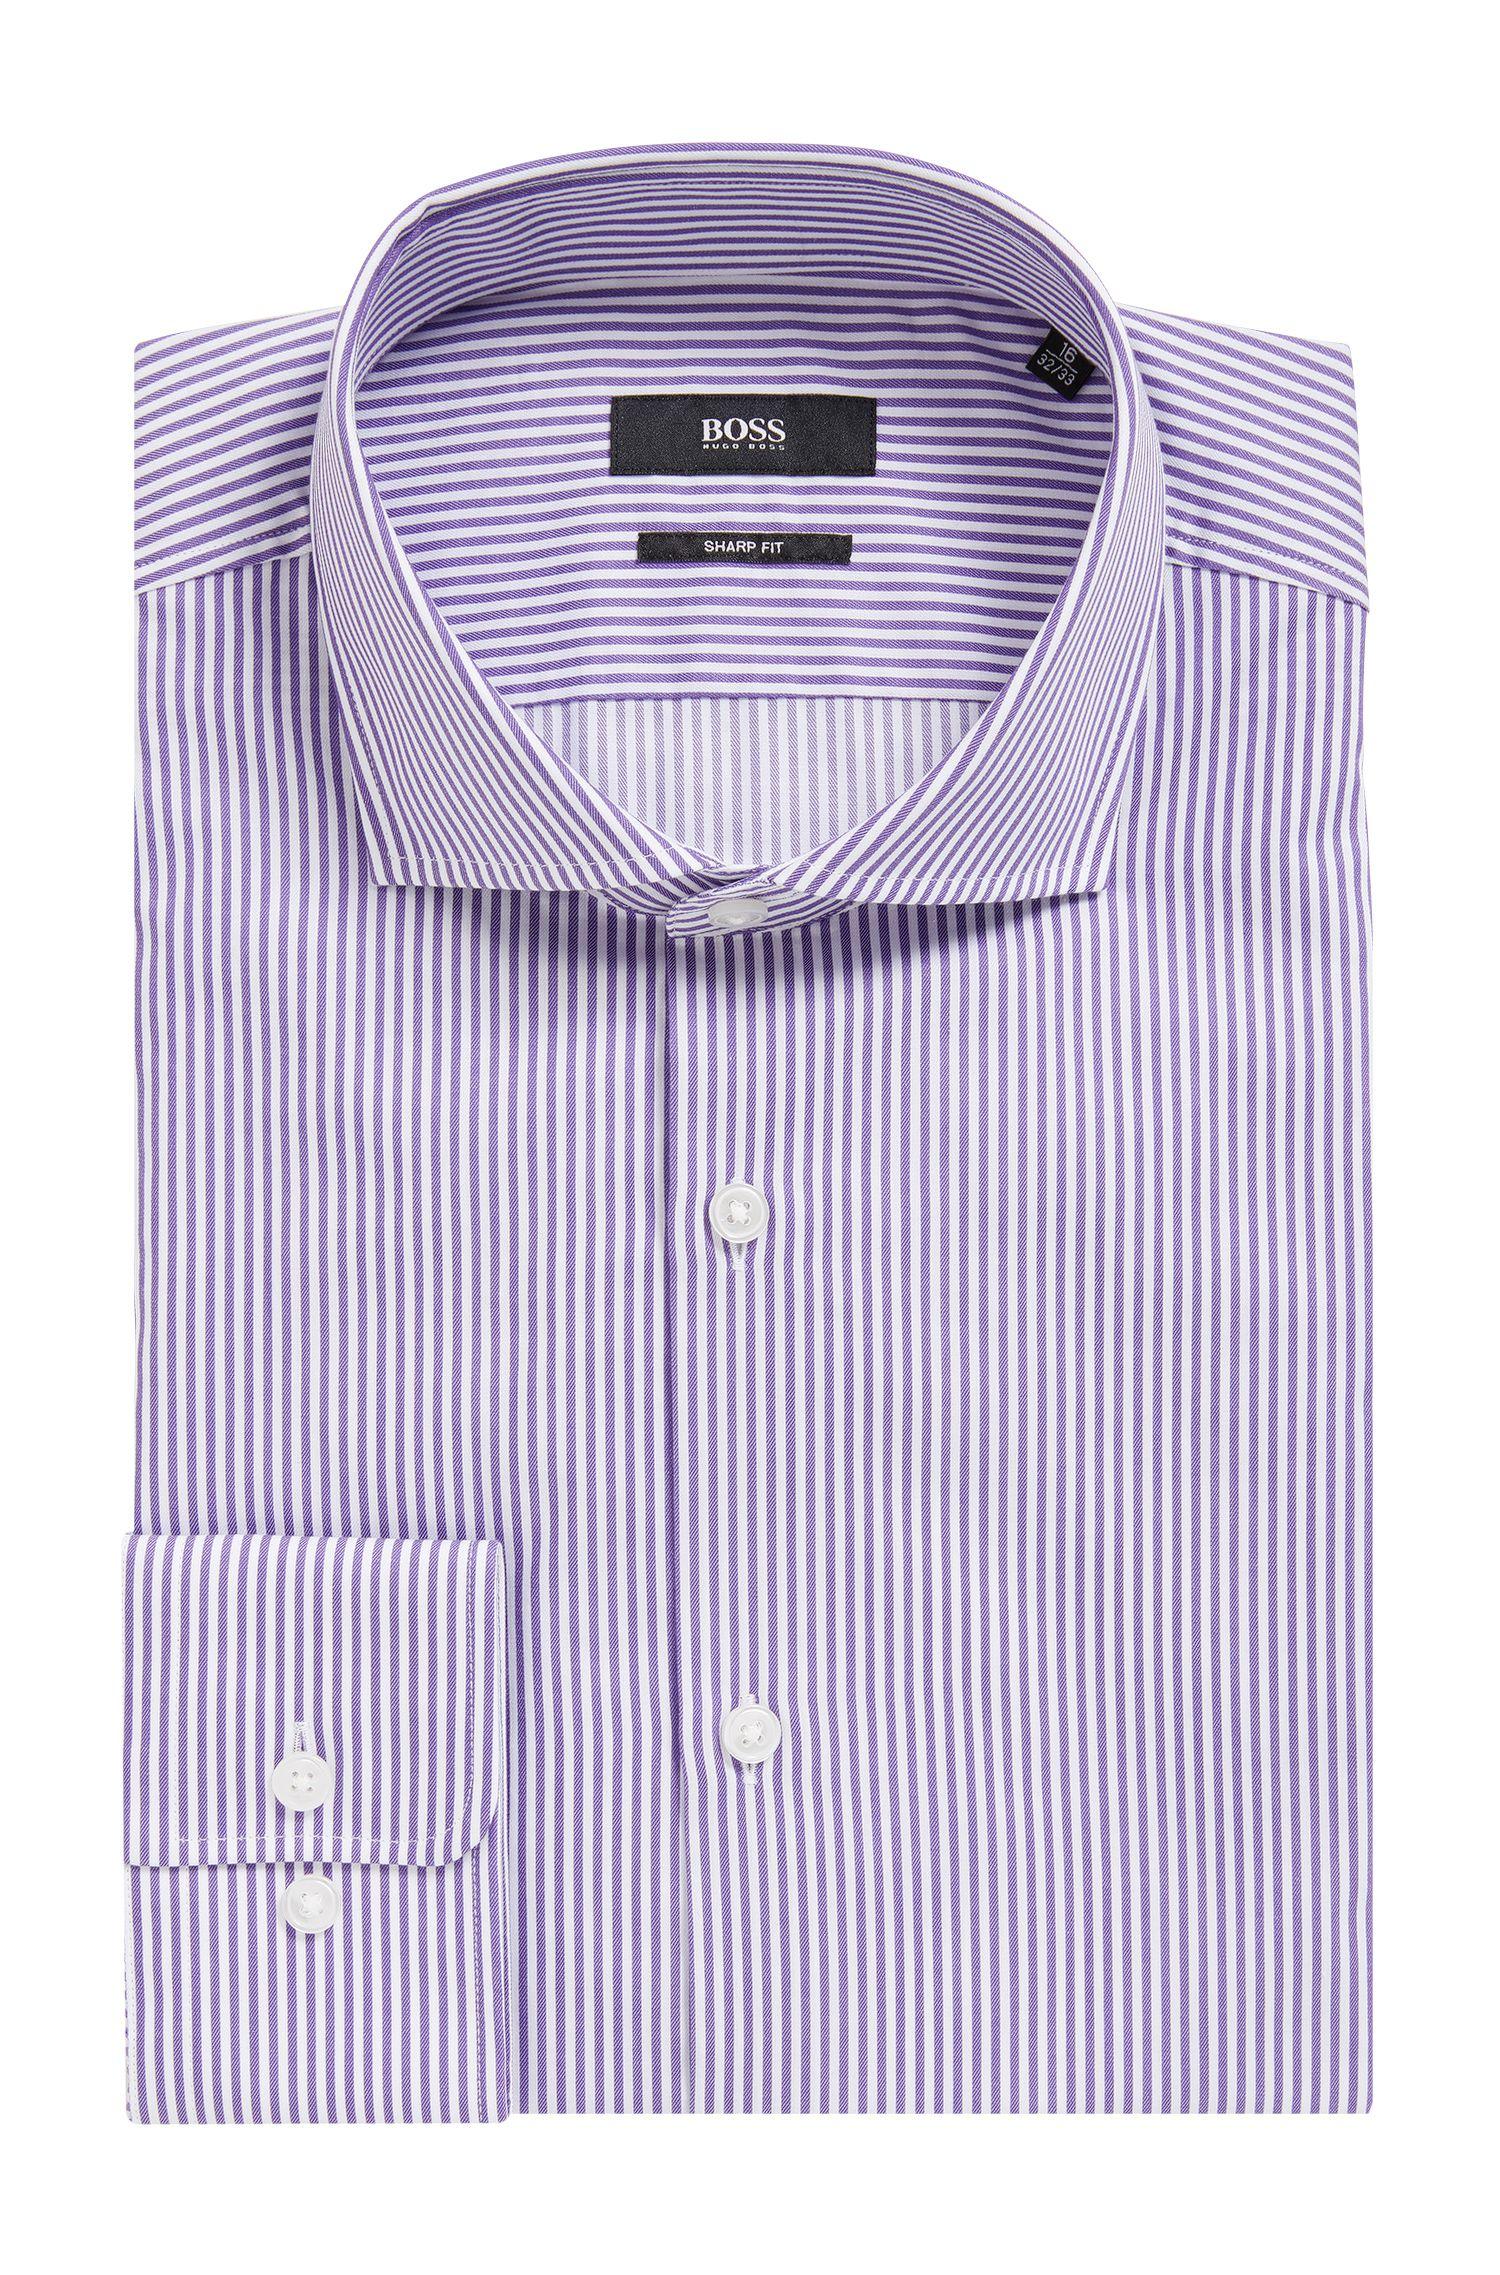 Striped Cotton Dress Shirt | Mark US